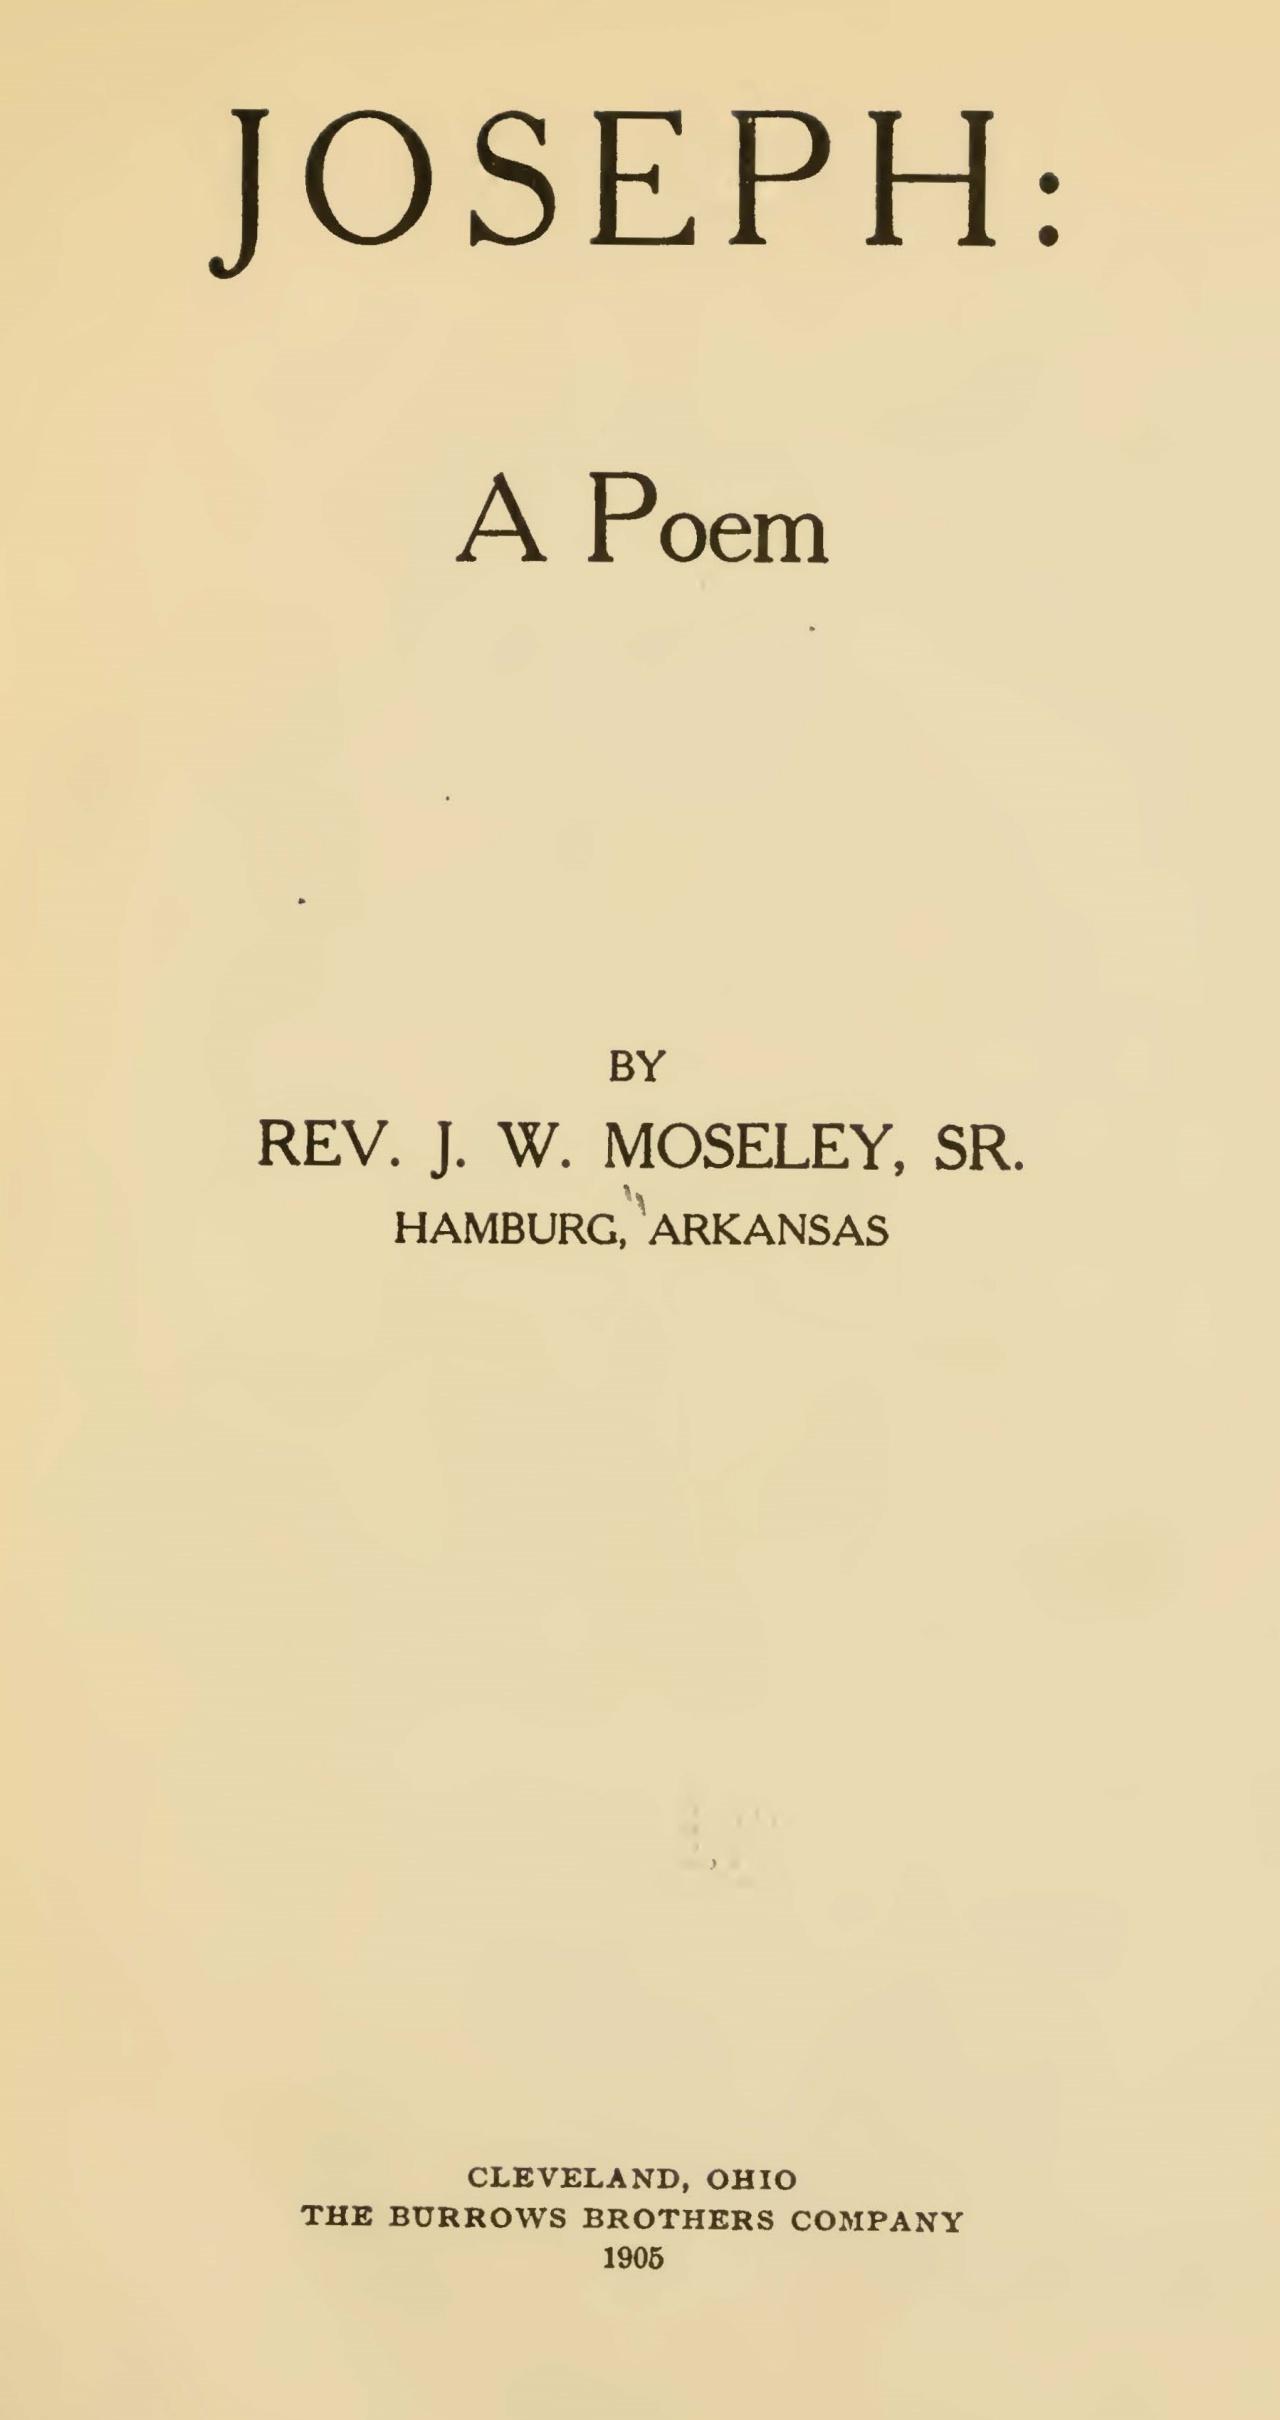 Moseley, Sr., John Watkins, Joseph A Poem Title Page.jpg